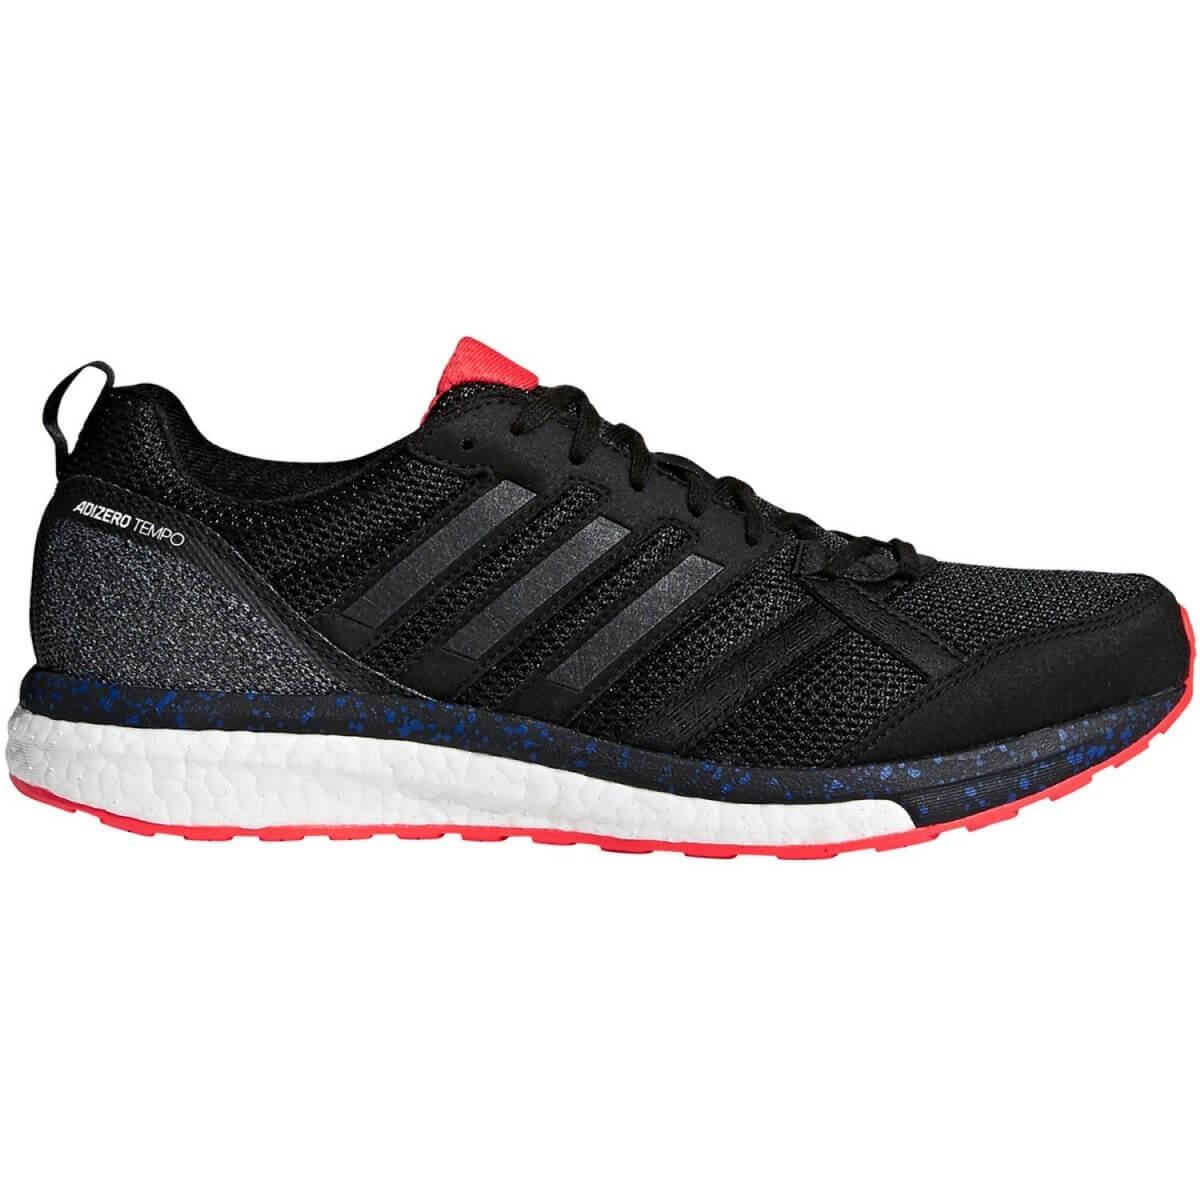 Tempo Adizero Adidas Pv18 Zapatillas Aktiv 9 bfyvIY76gm